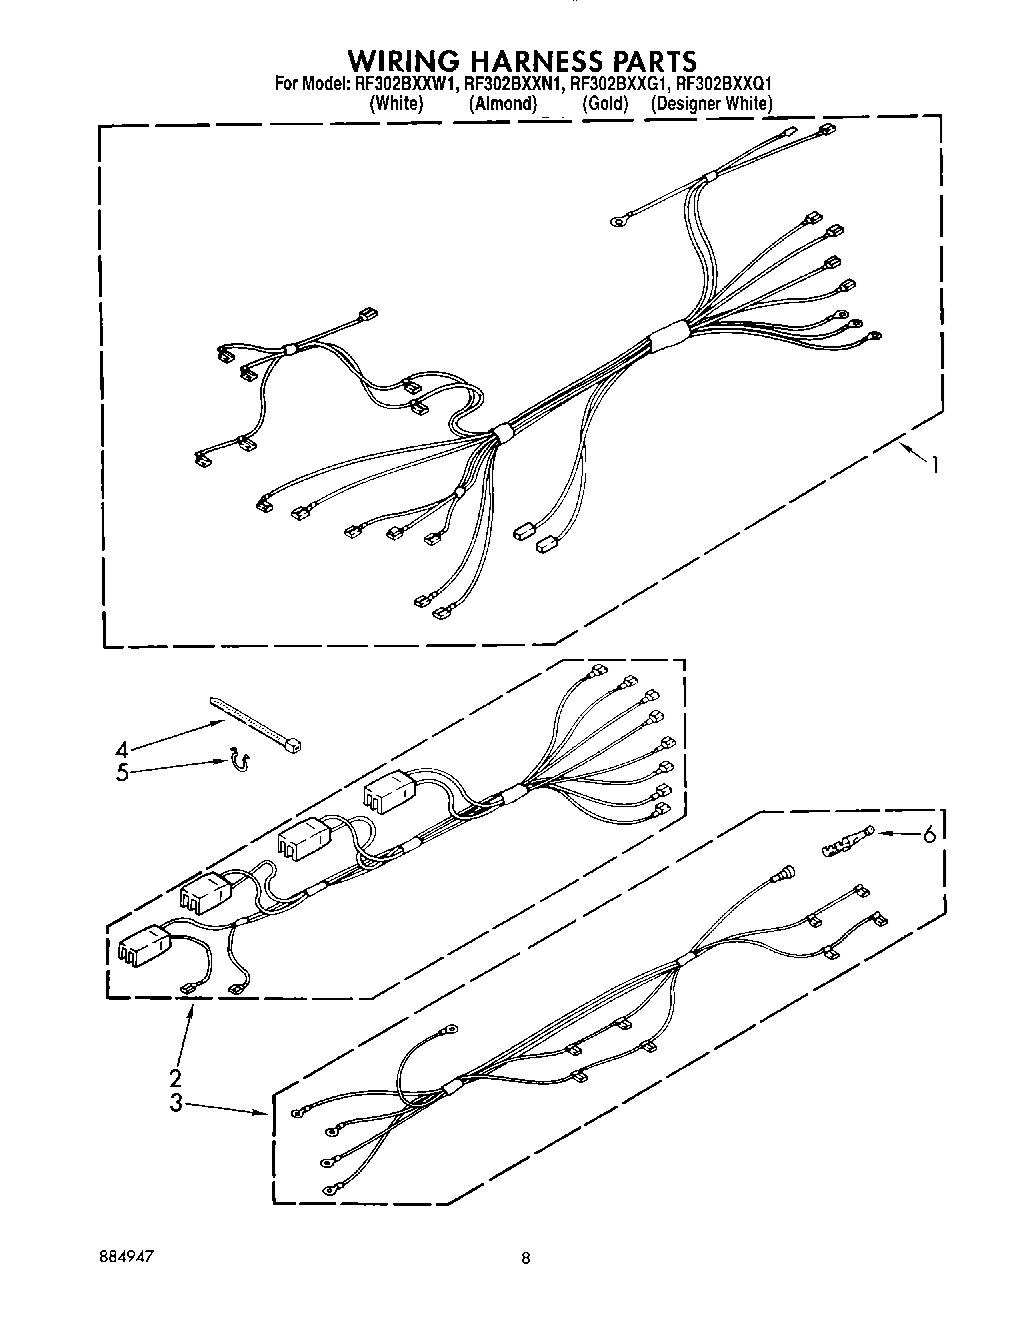 wiring diagram for whirlpool range infinite switch fuel